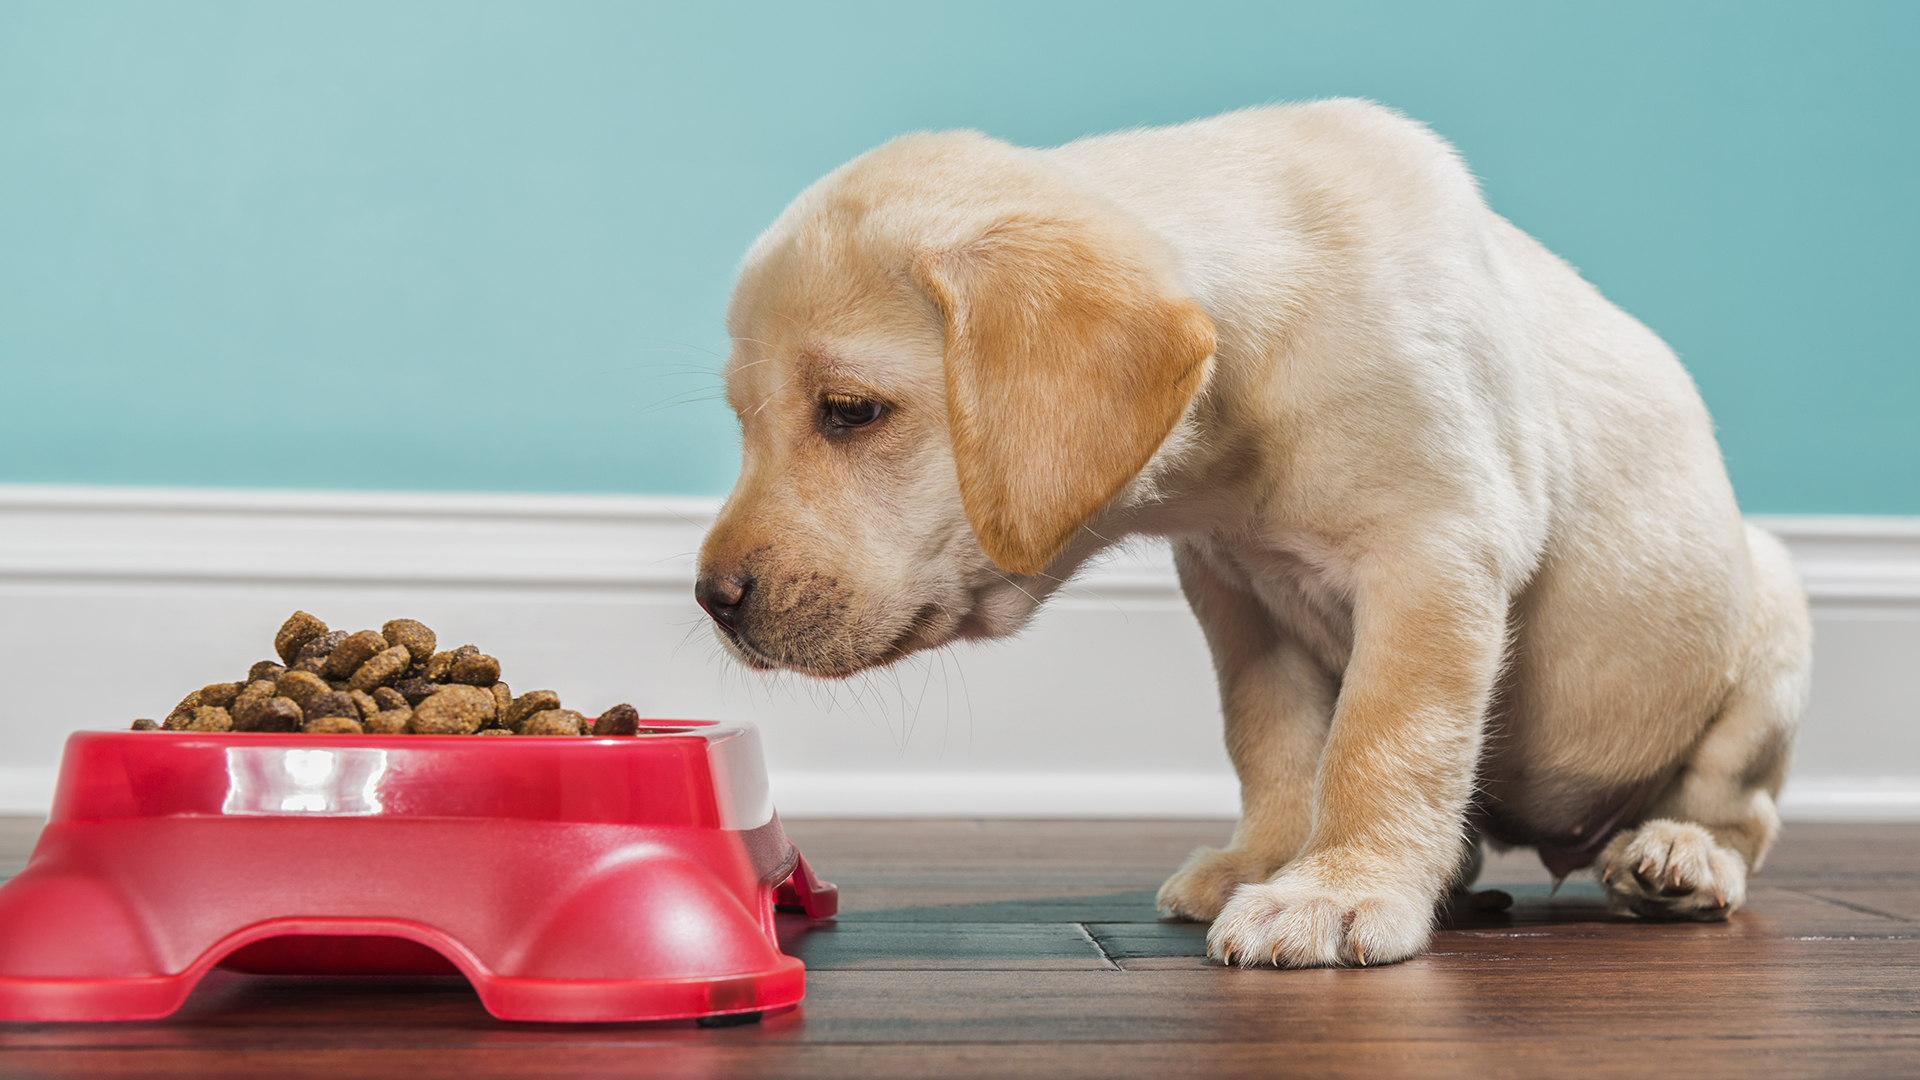 Kibbles 'n Bits, other dog food brands recalled after euthanasia ...